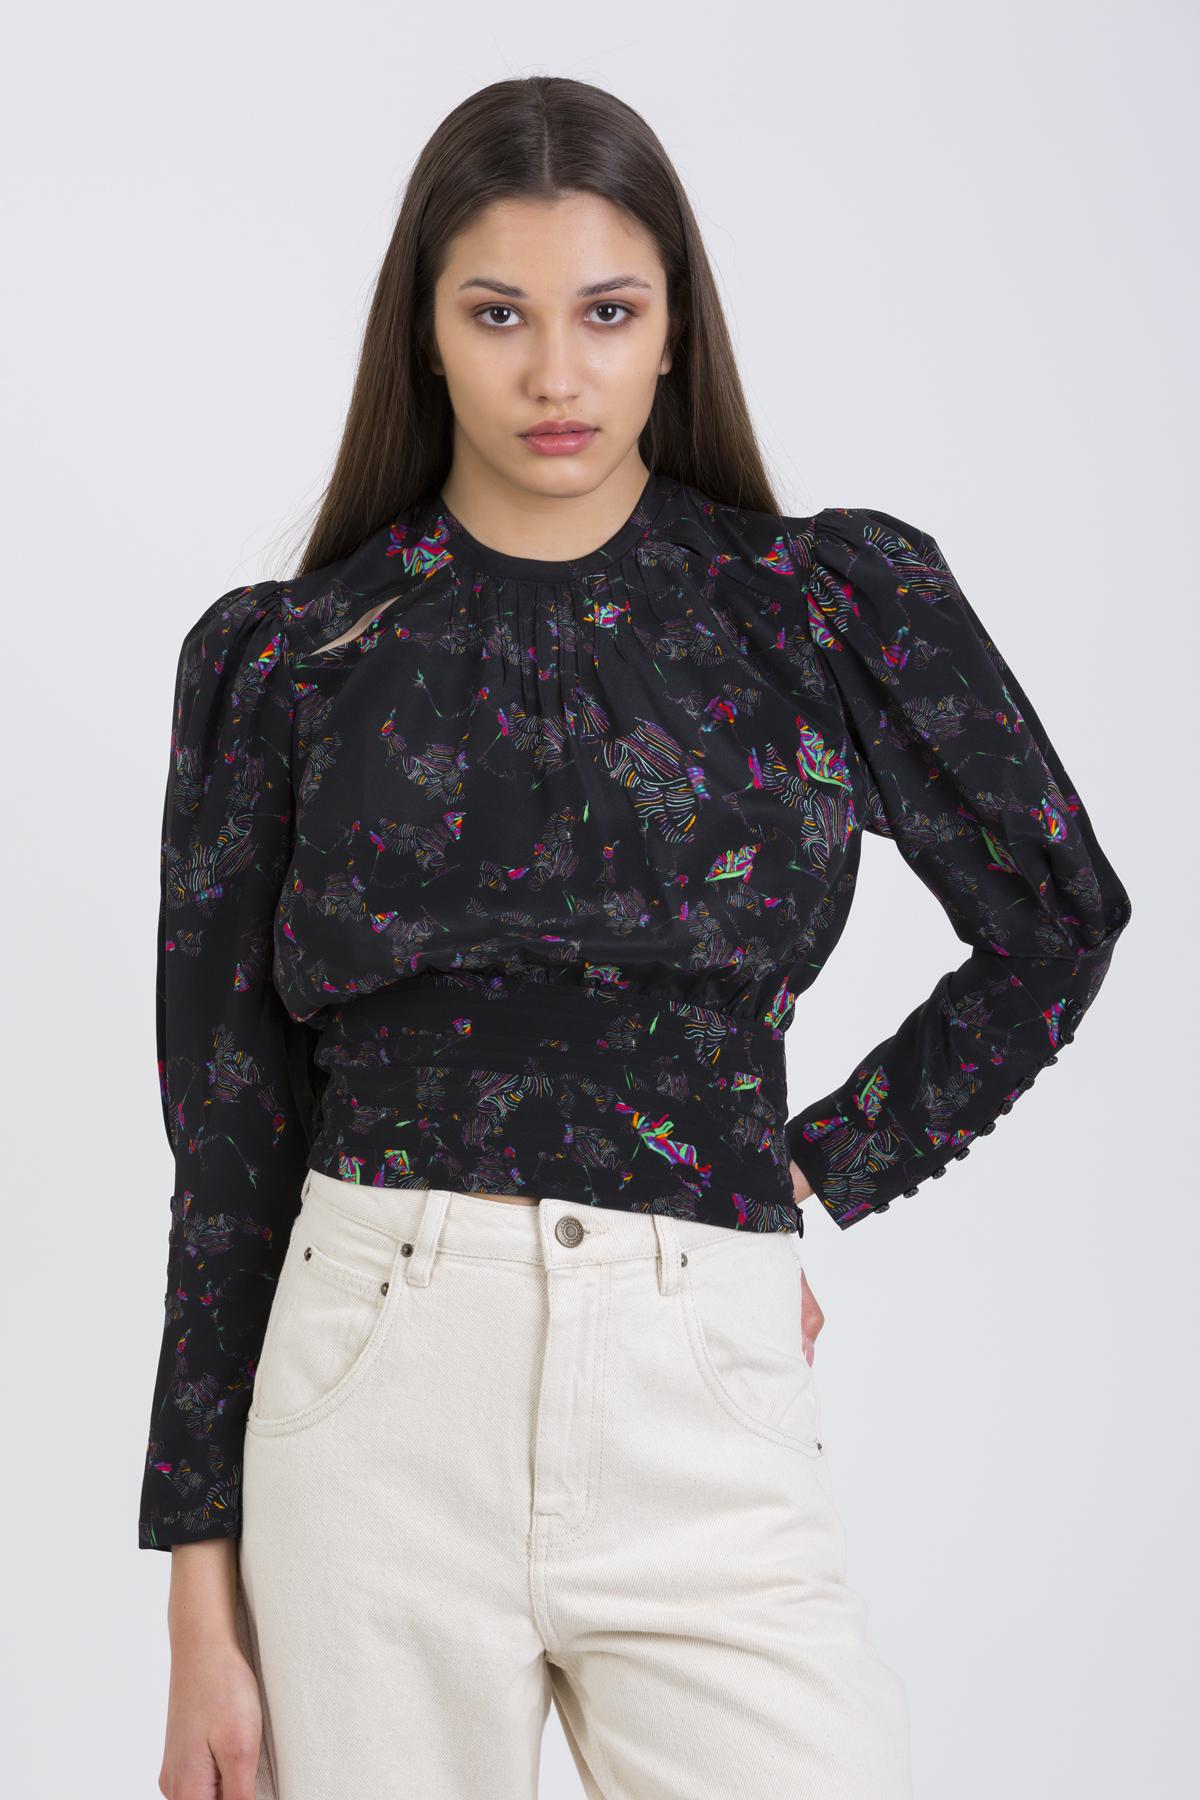 lorelli-top-silk-black-iro-puffy-sleeves-matchboxathens